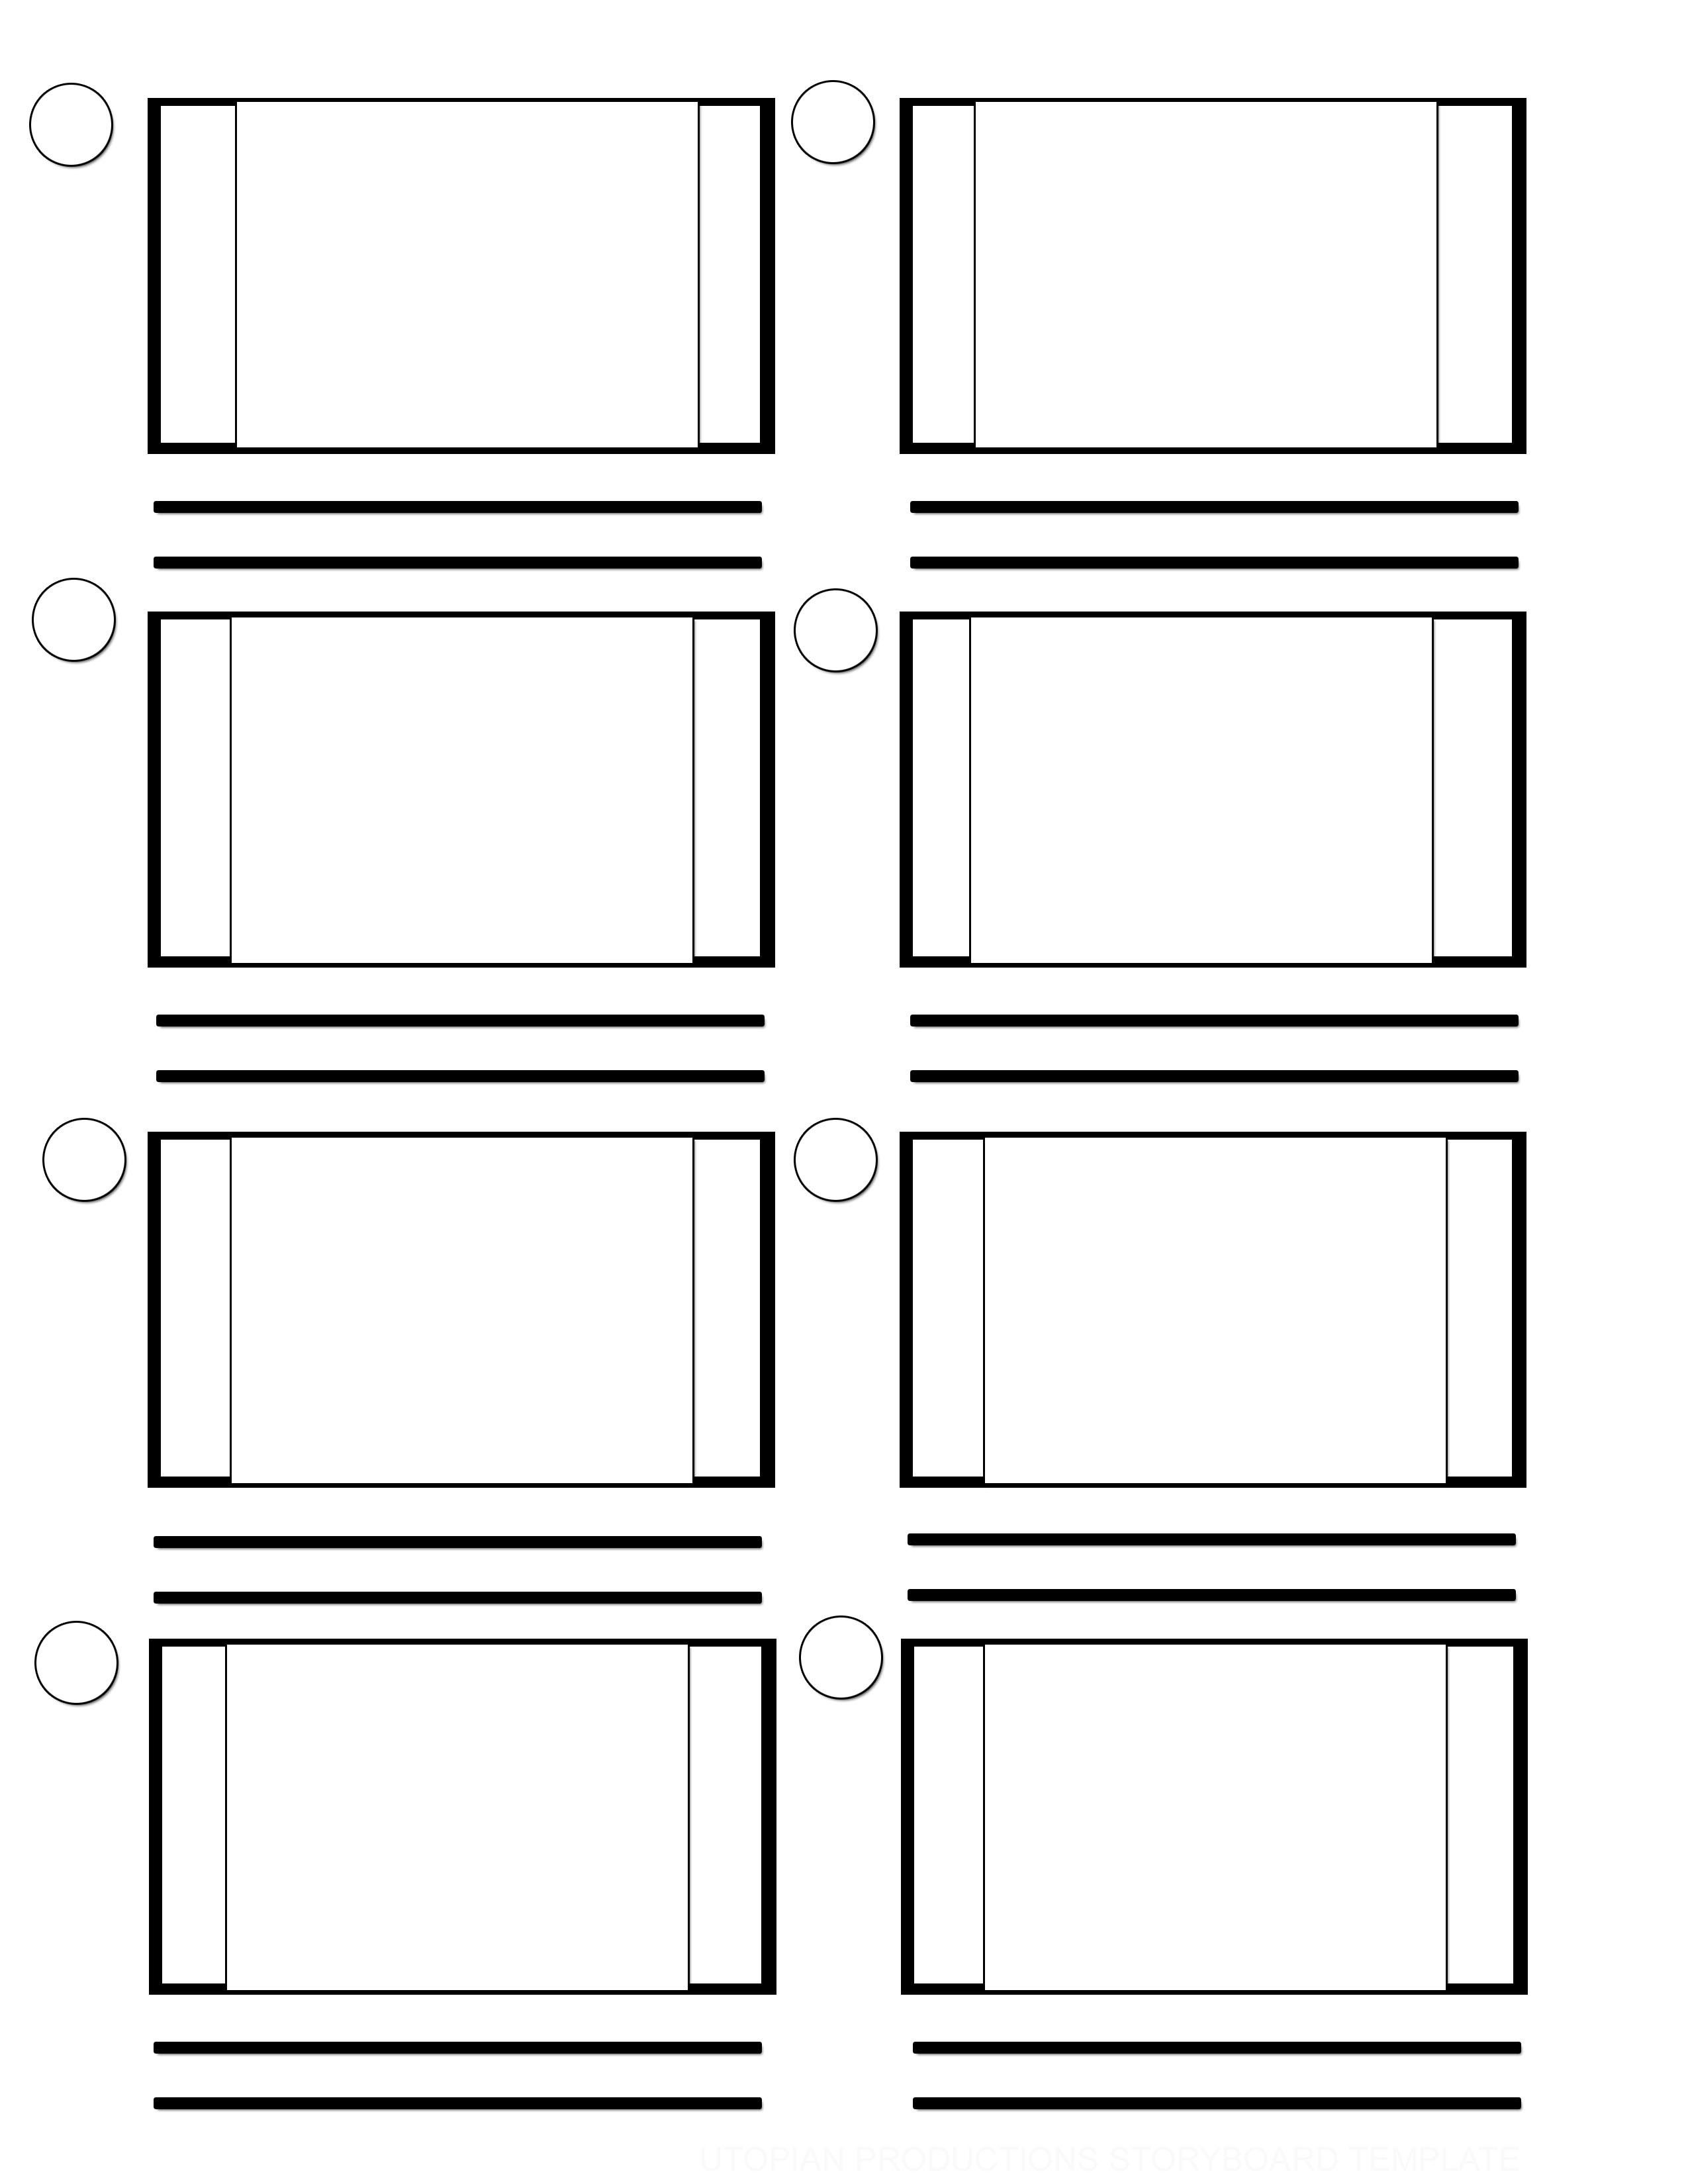 Full Frame Storyboard Template